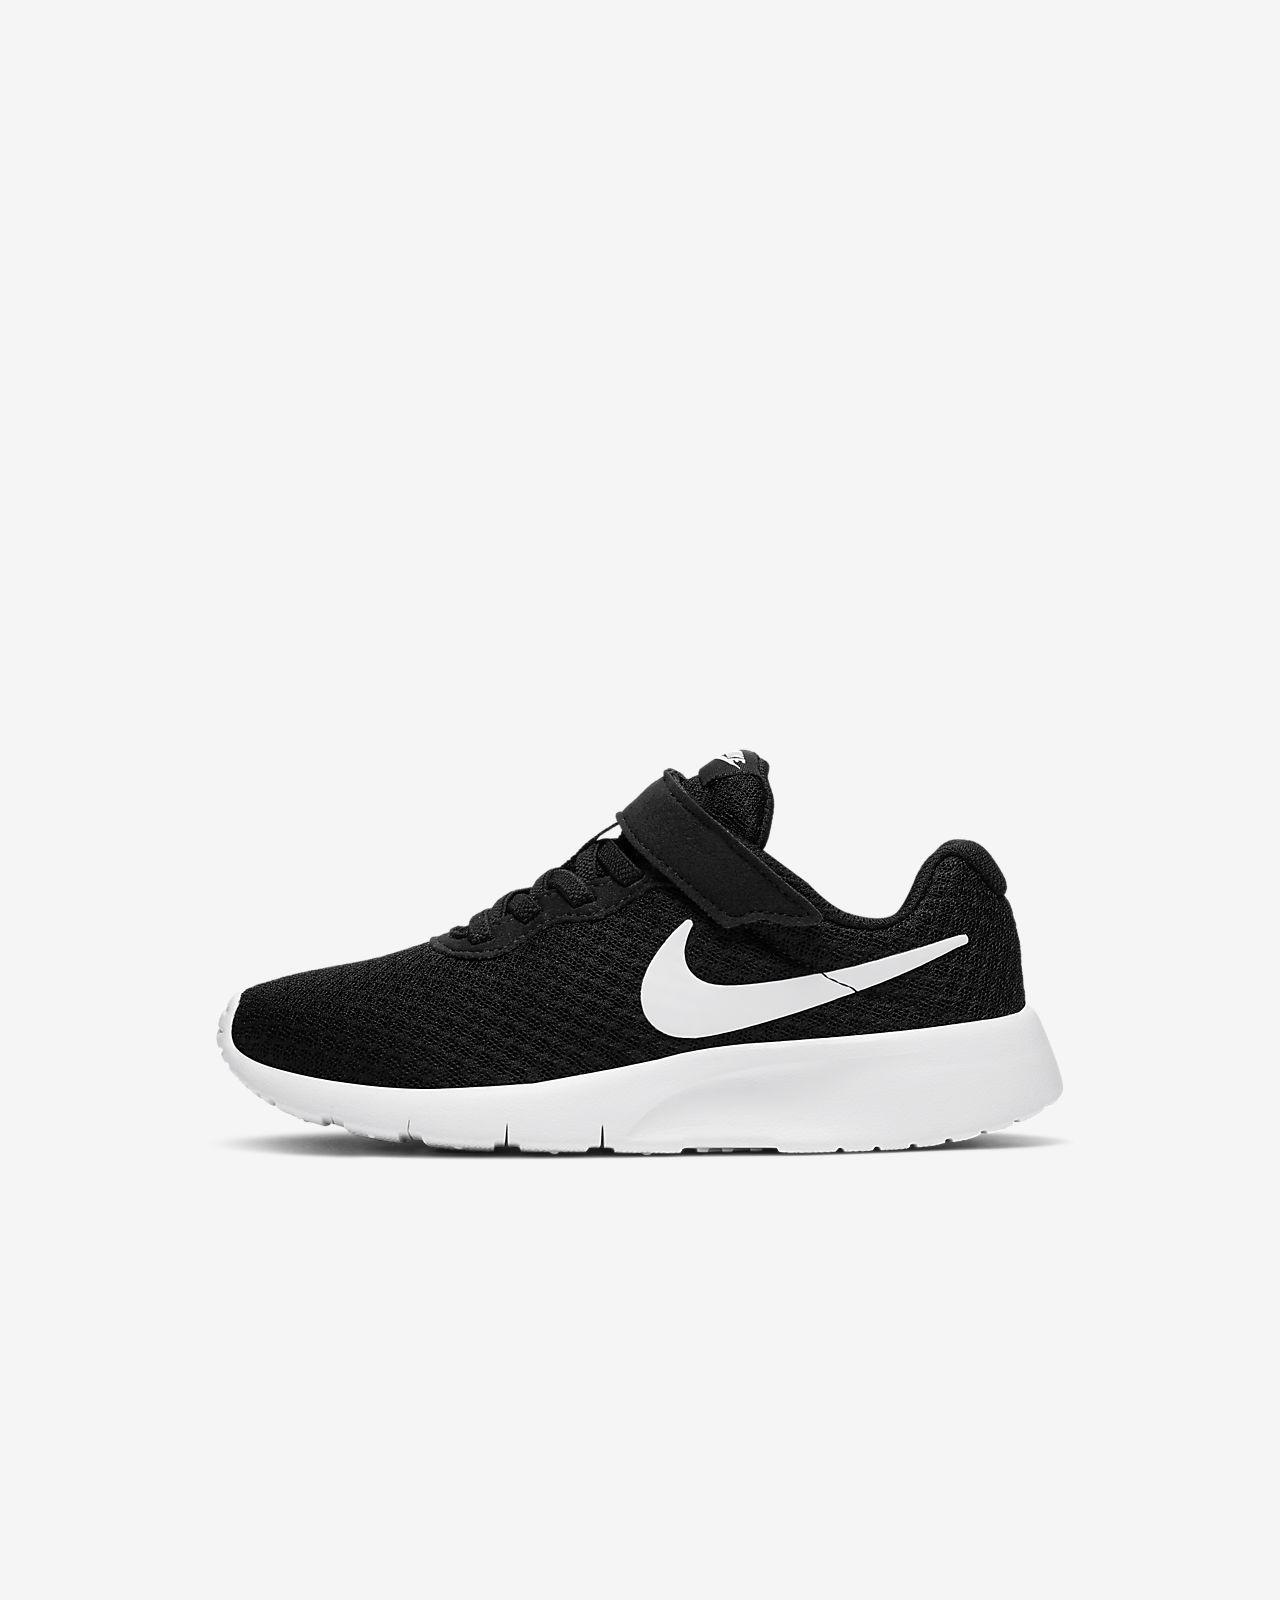 Nike Tanjun (PSV) 幼童运动童鞋